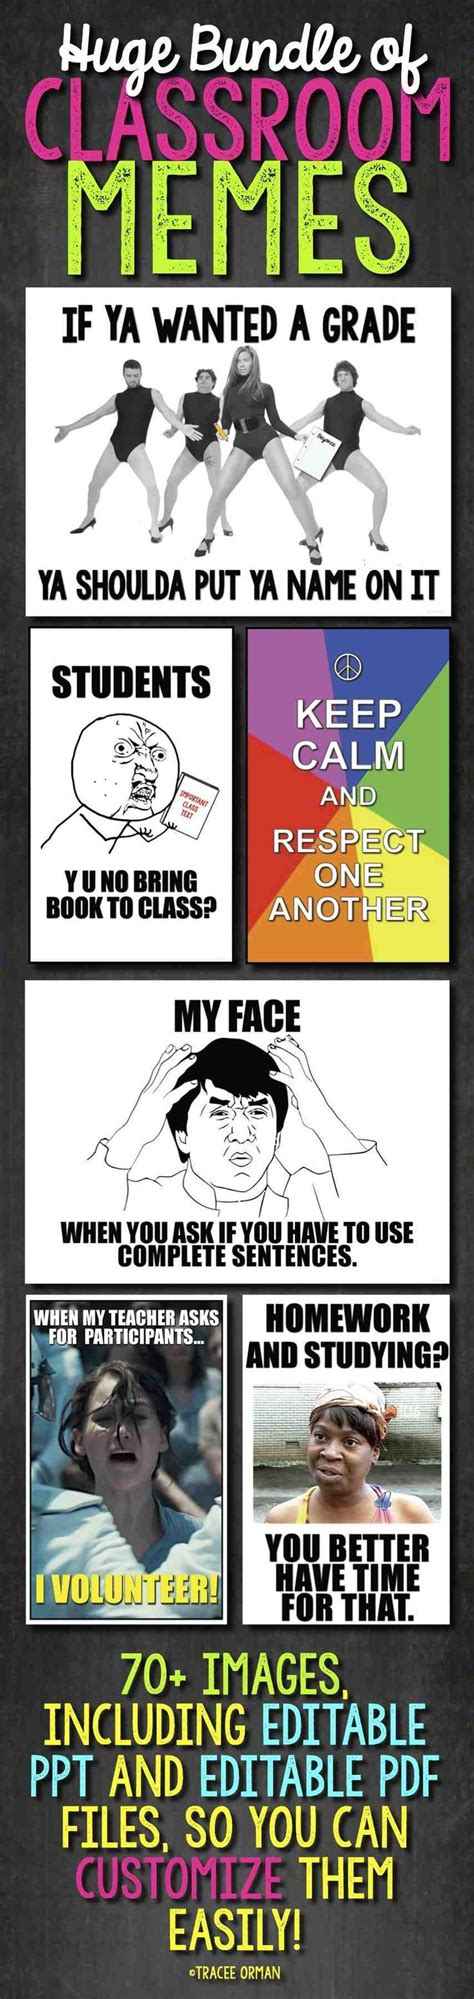 Teacher Meme Posters - 184 best images about teacher humor p on pinterest